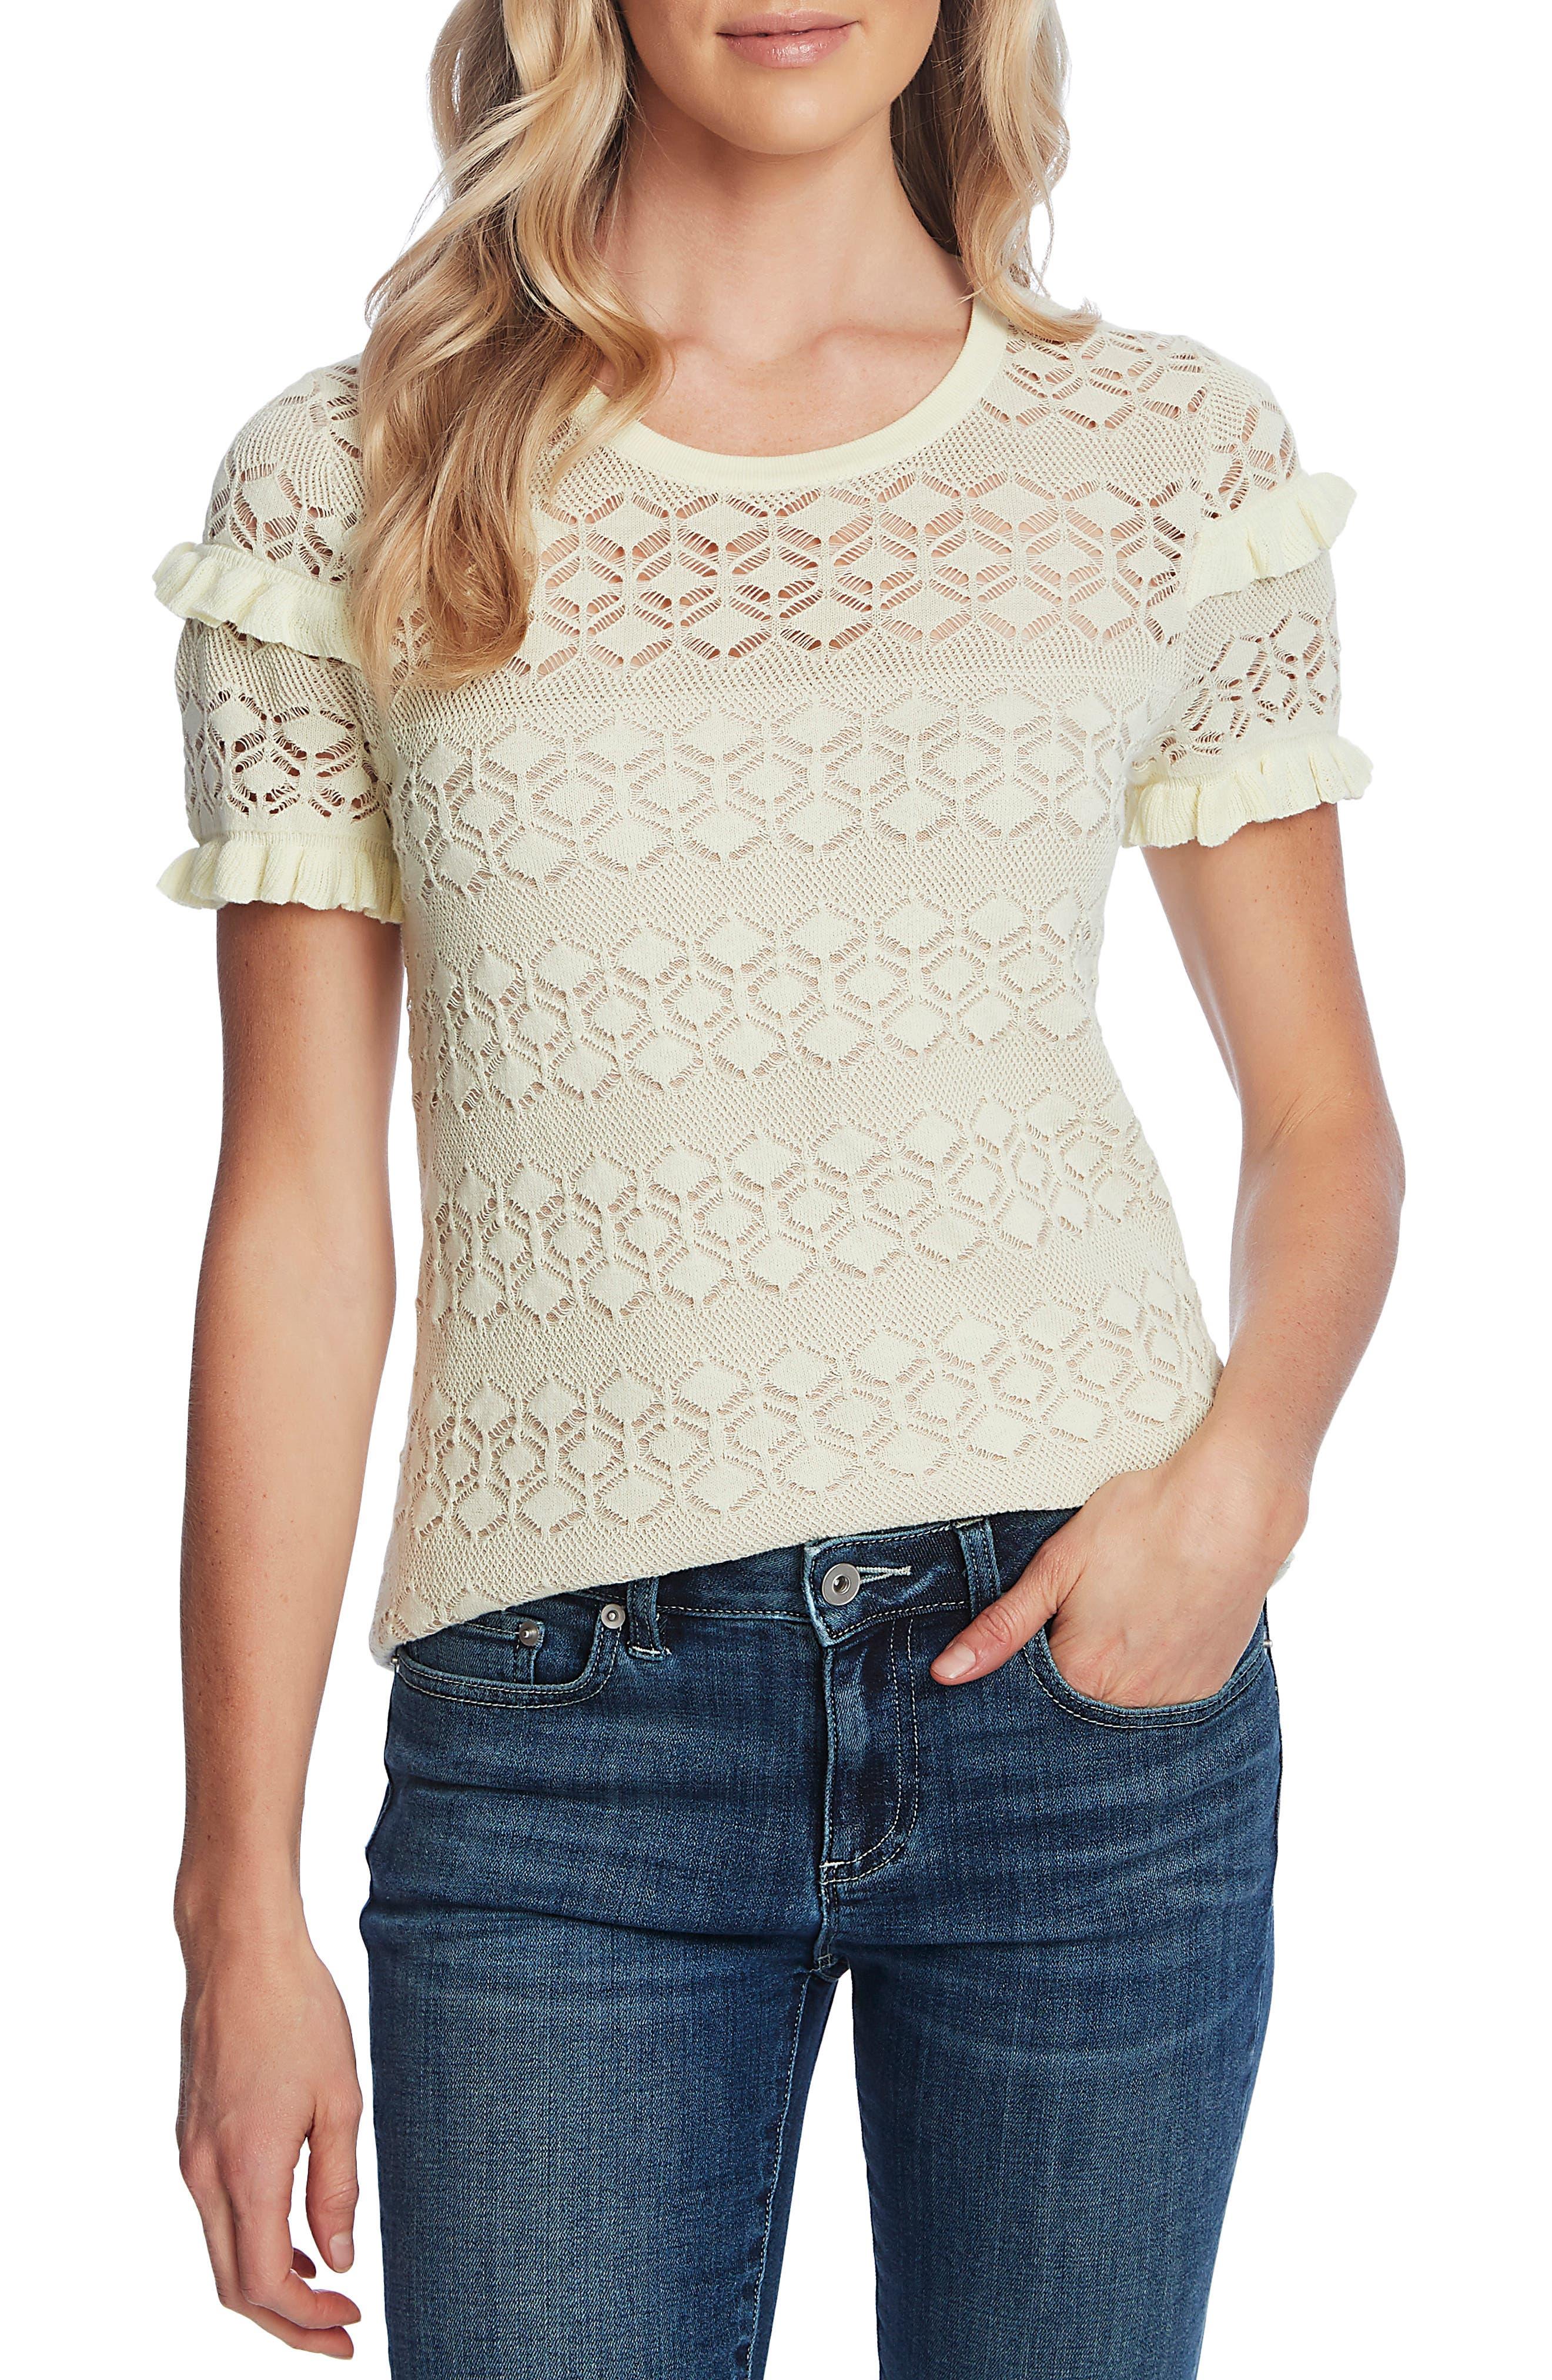 Vintage Tops & Retro Shirts, Halter Tops, Blouses Womens Cece Ruffle Detail Pointelle Short Sleeve Sweater $79.00 AT vintagedancer.com